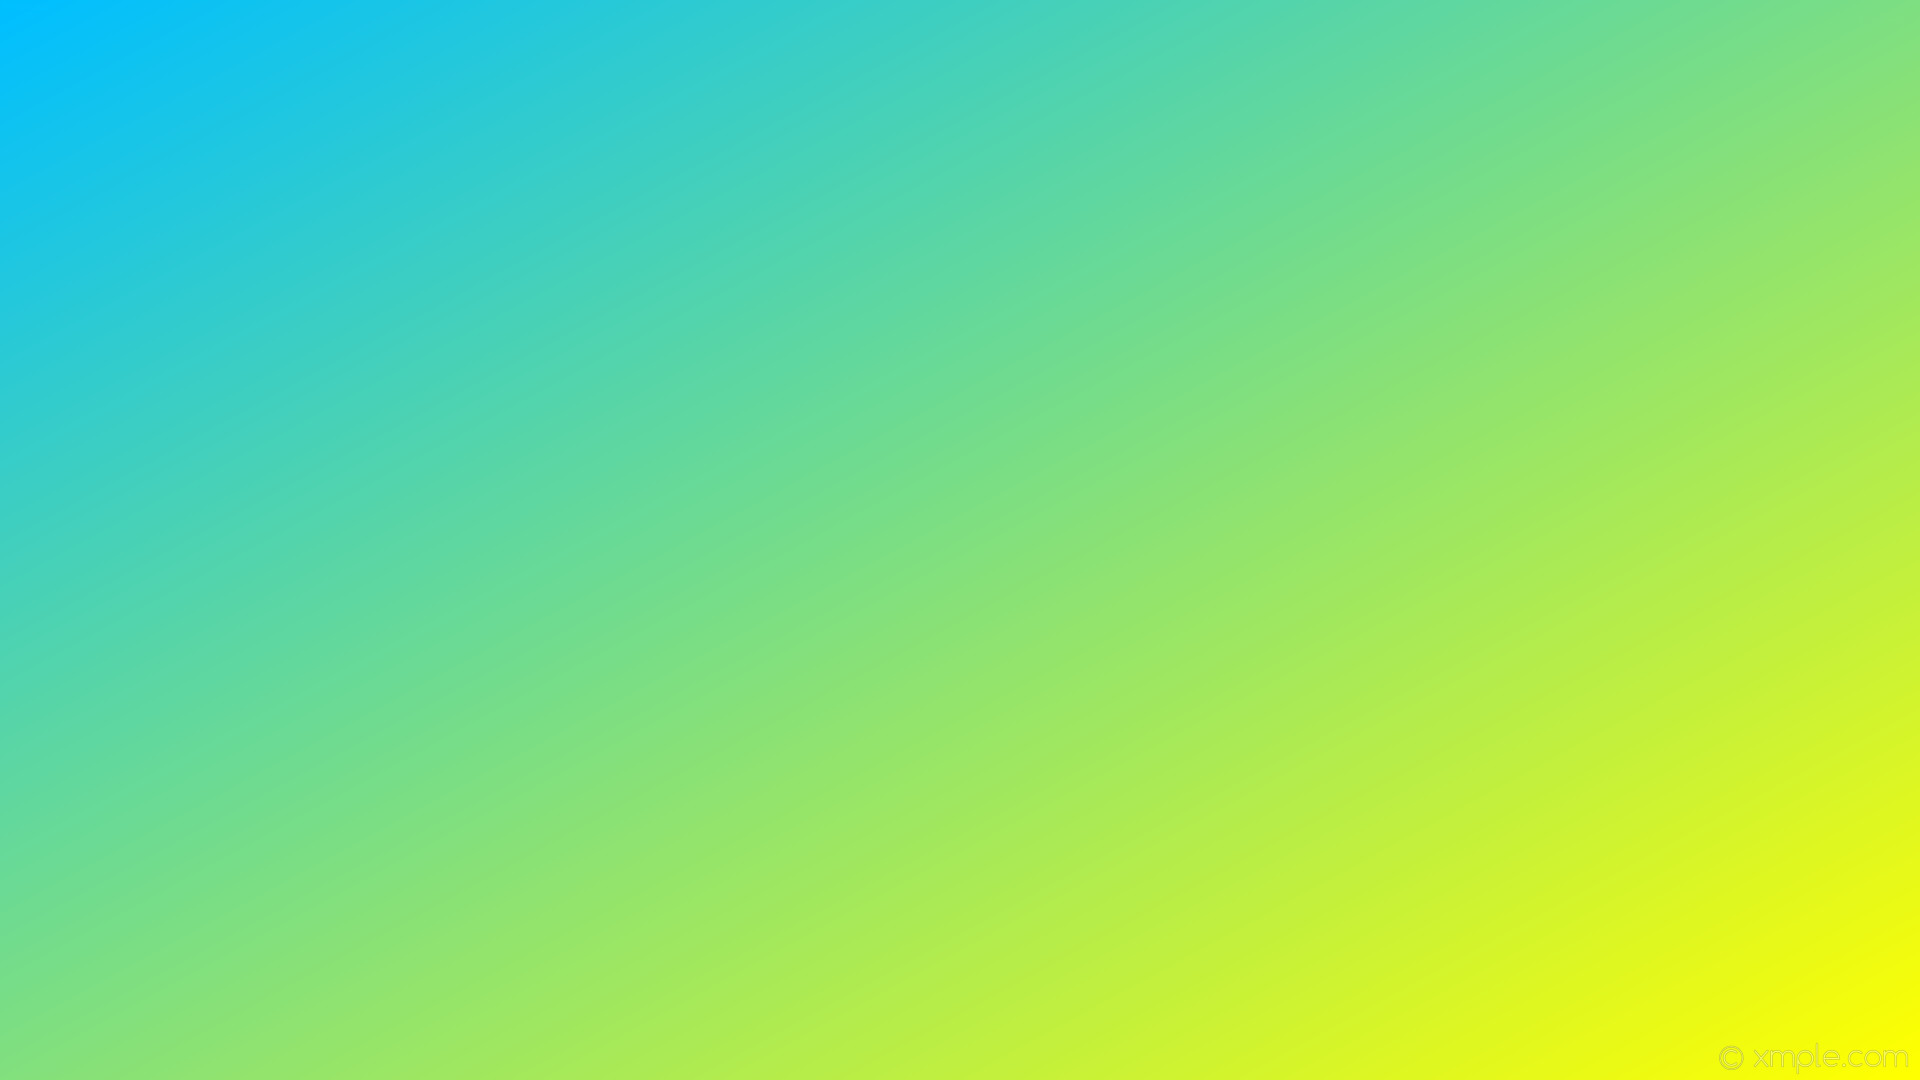 wallpaper gradient yellow blue linear deep sky blue #ffff00 #00bfff 330°